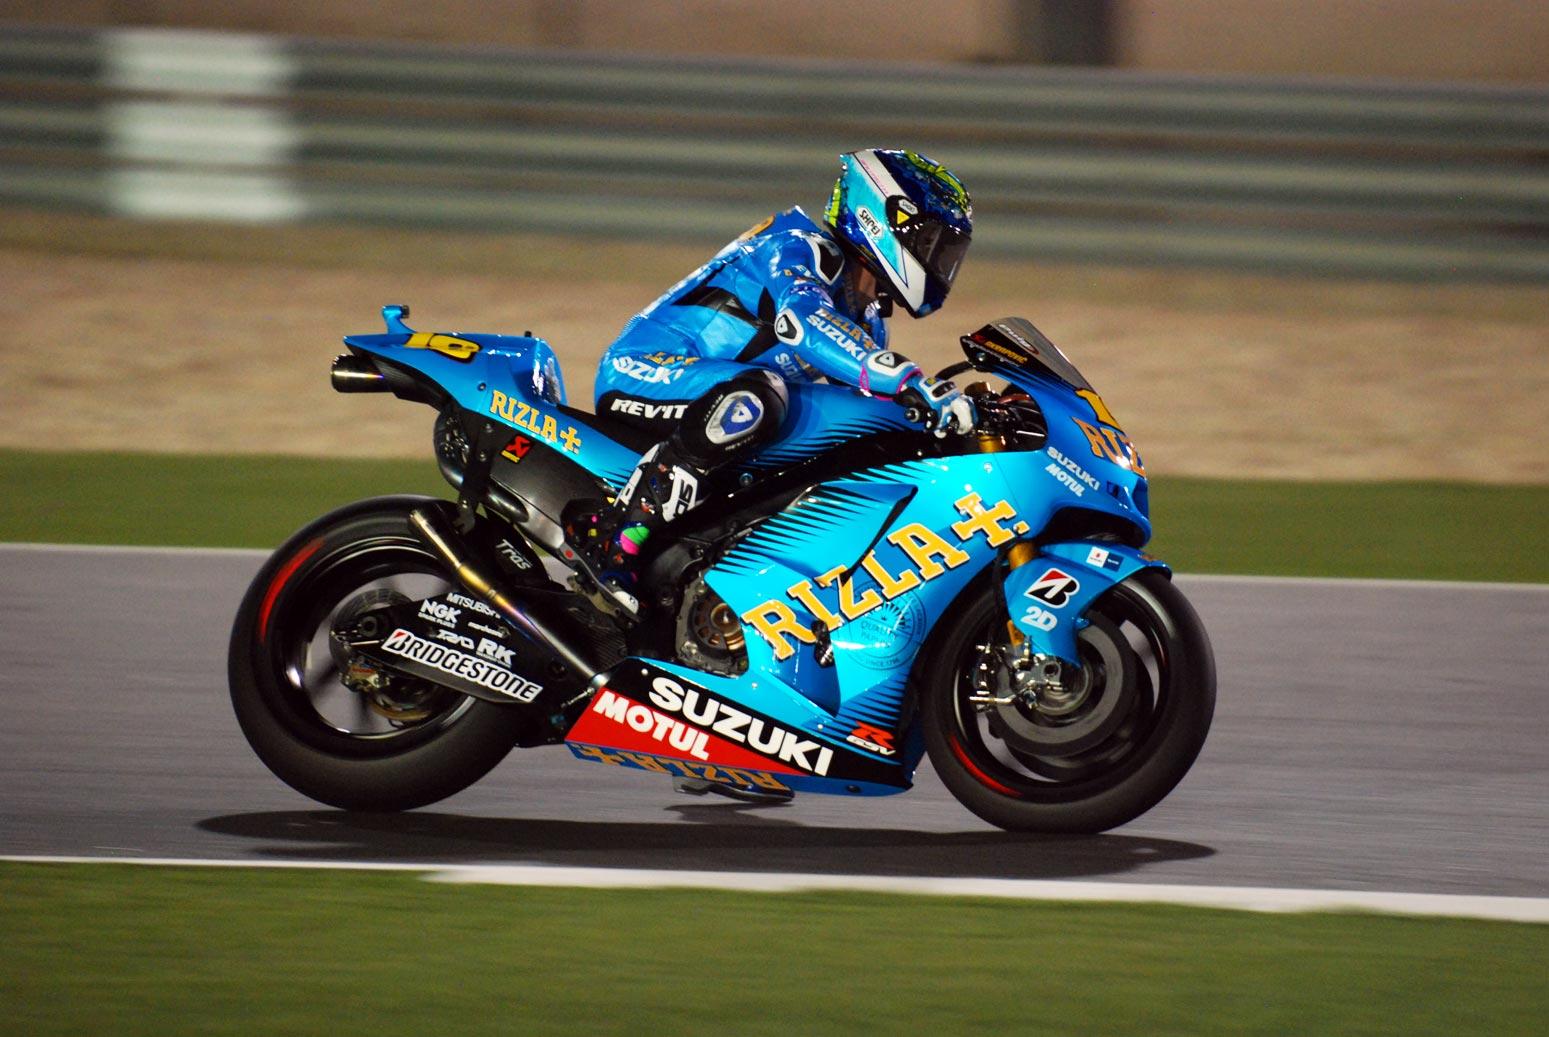 Rizla Suzuki to Sit Out Qatar GP - Asphalt & Rubber